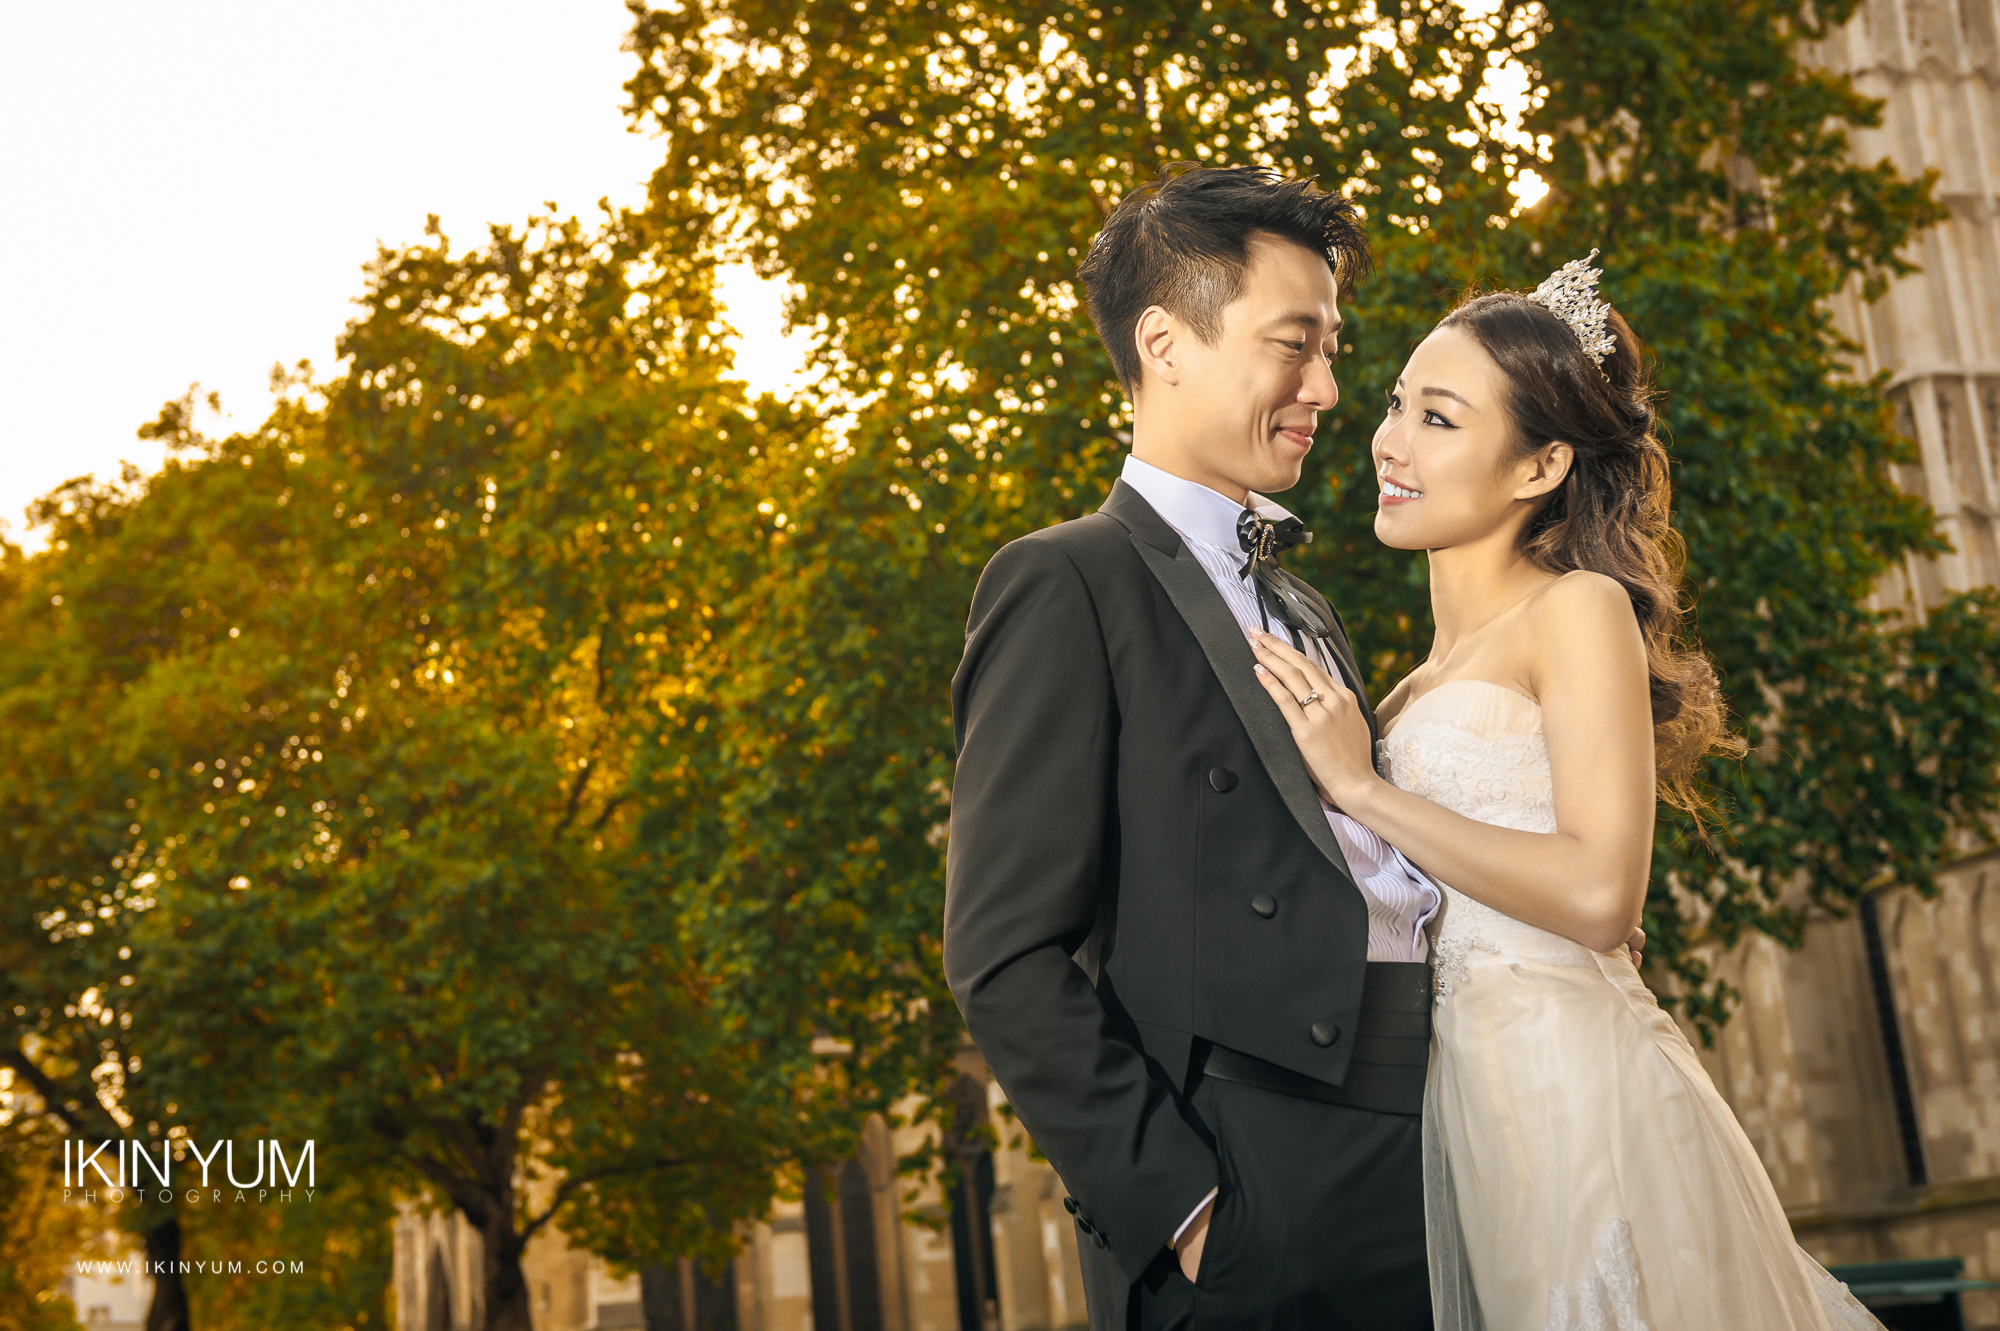 Yannis & Kenny Pre-Wedding Shoot - Ikin Yum Photography-0048.jpg